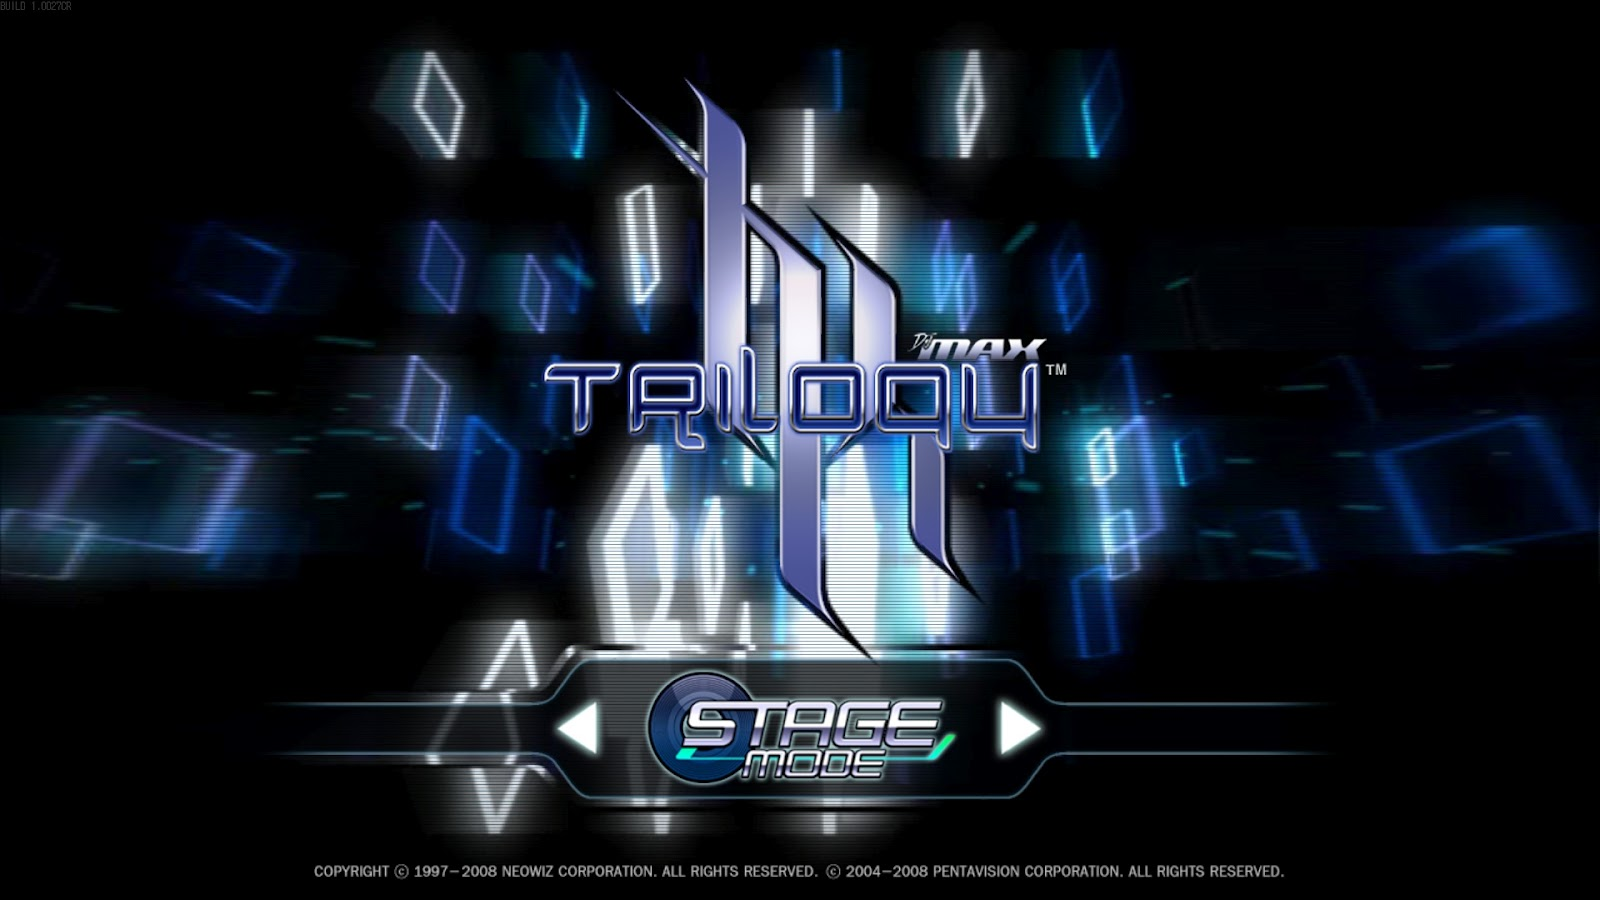 dj max trilogy pc download free